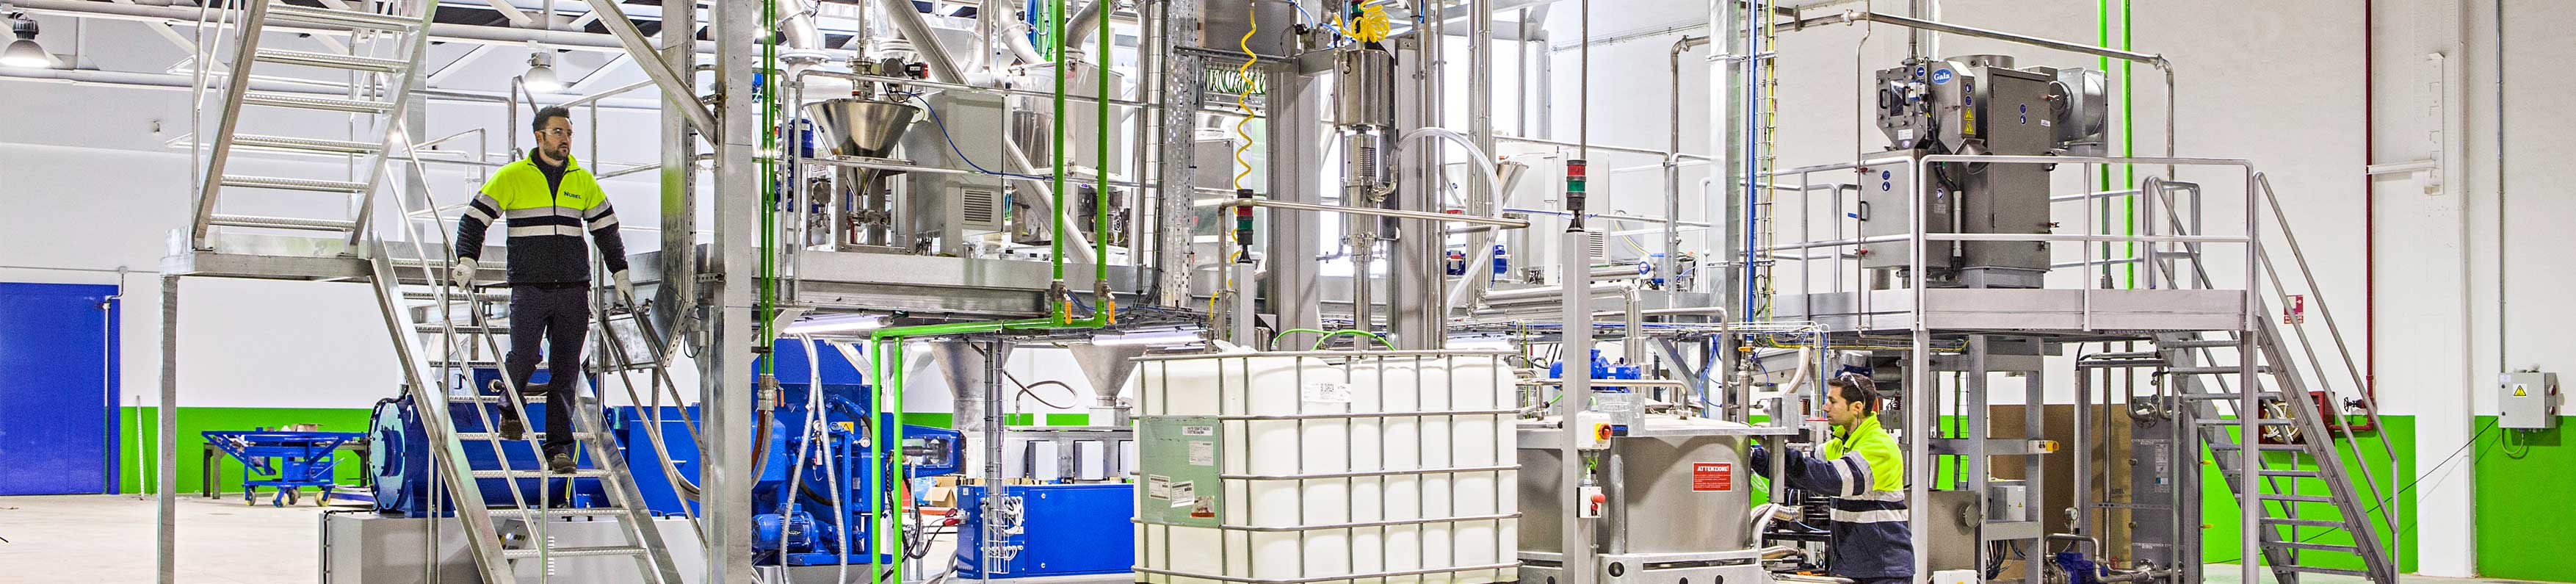 NUREL Biopolymers INZEA Biopolymers Tests y Certificaciones